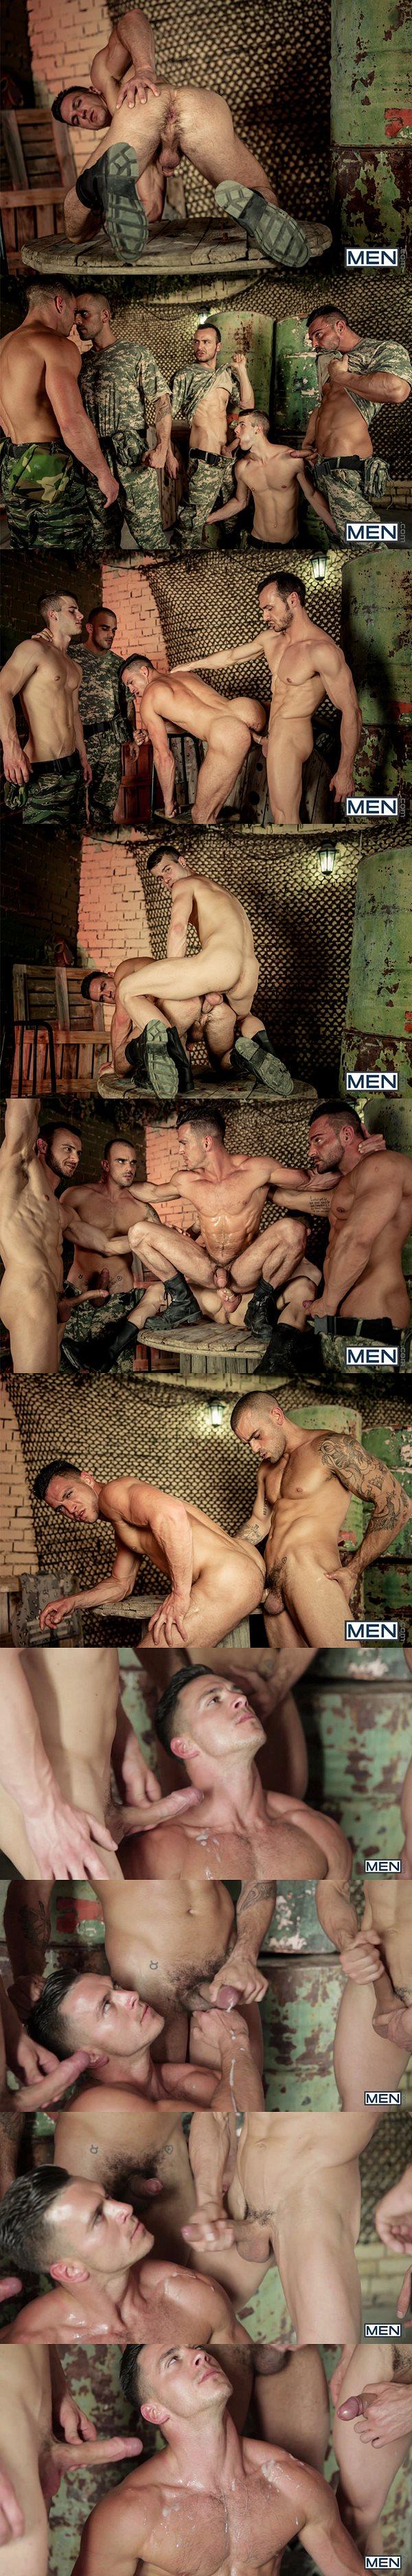 Four muscle studs Alex Brando, Allen King, Damien Crosse & Gabriel Vanderloo gangbang Paddy O'Brian's tight hairy hole in Prisoner of War Part 4 at Jizzorgy 02